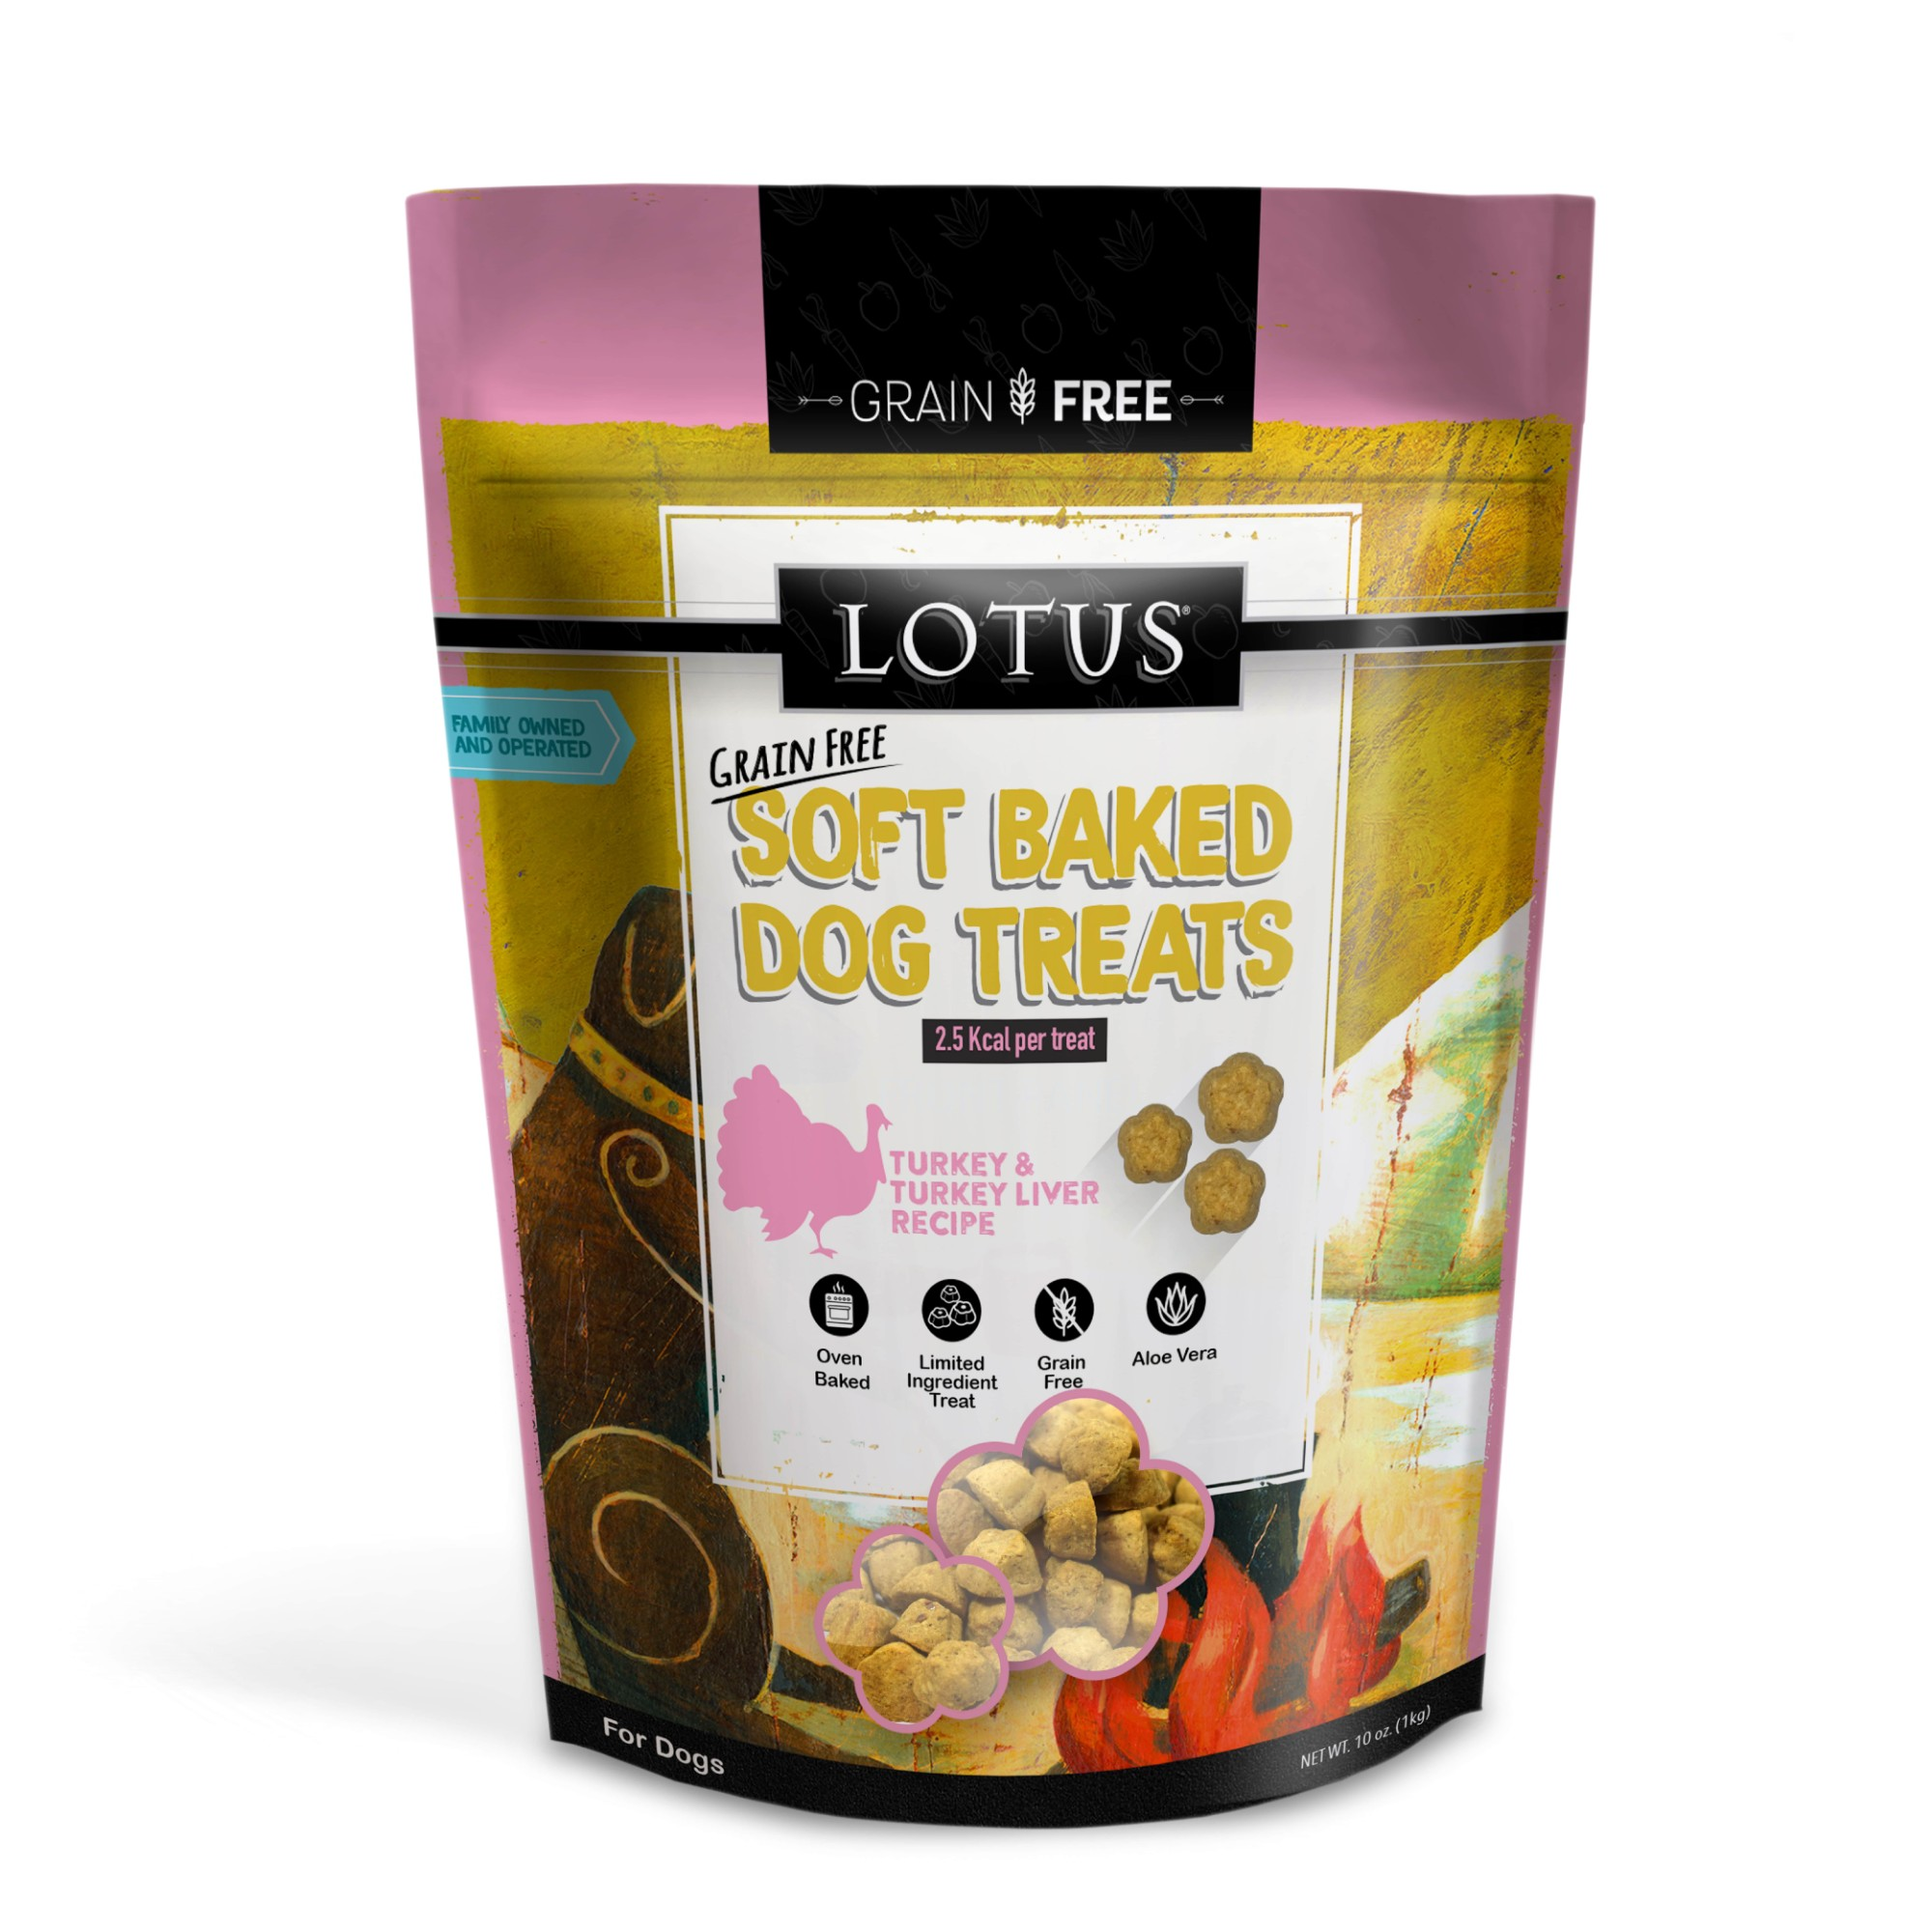 Lotus Soft-Baked Turkey and Turkey Liver Recipe Grain-Free Dog Treats, 10-oz bag